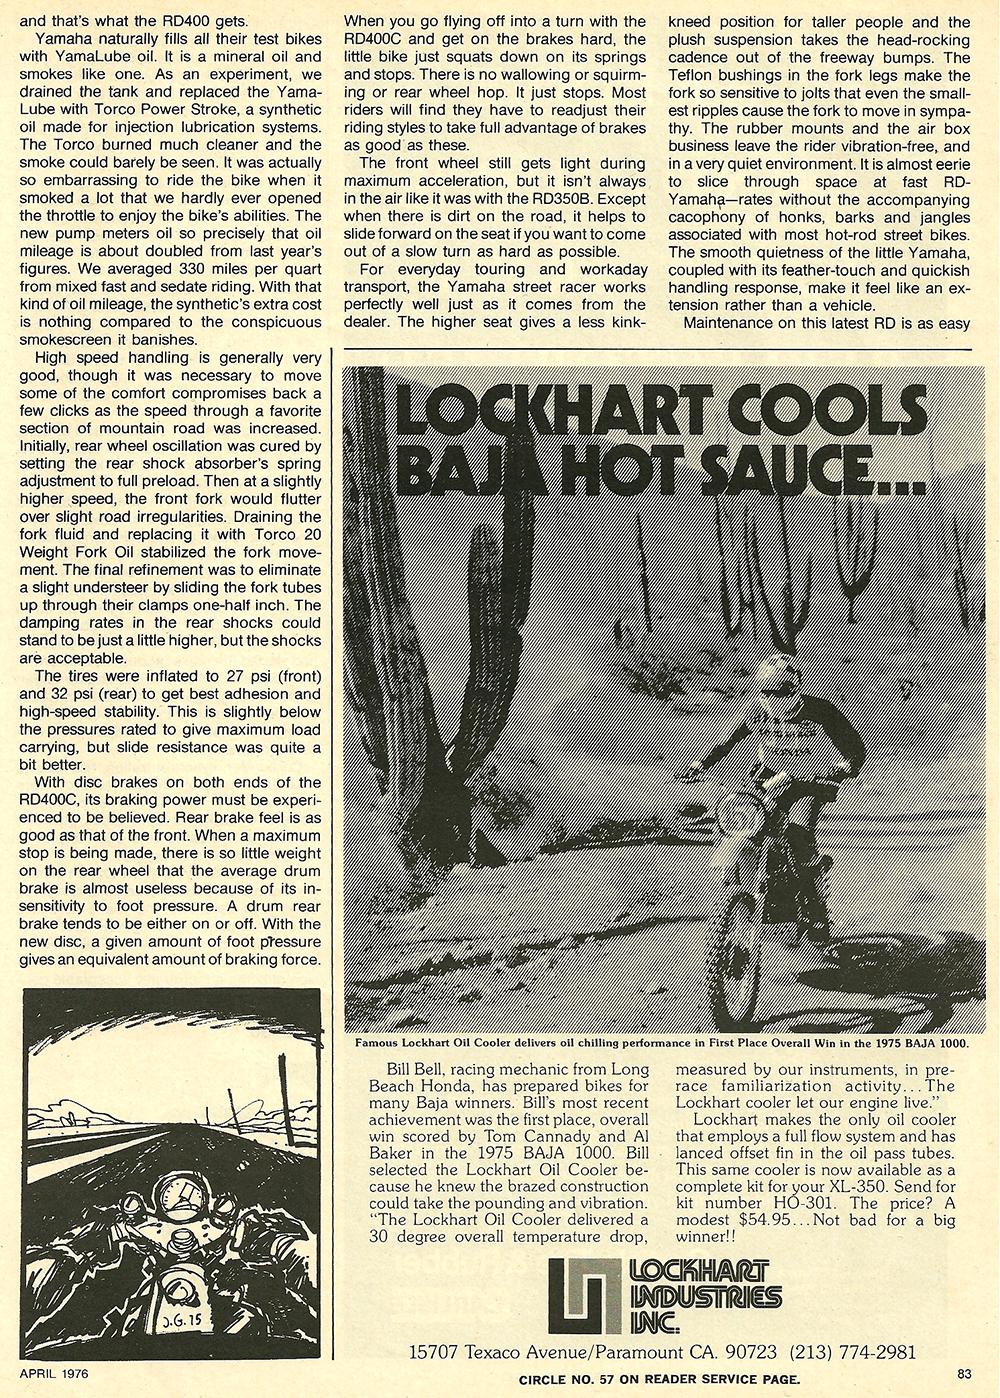 1976 Yamaha RD400C road test 8.jpg